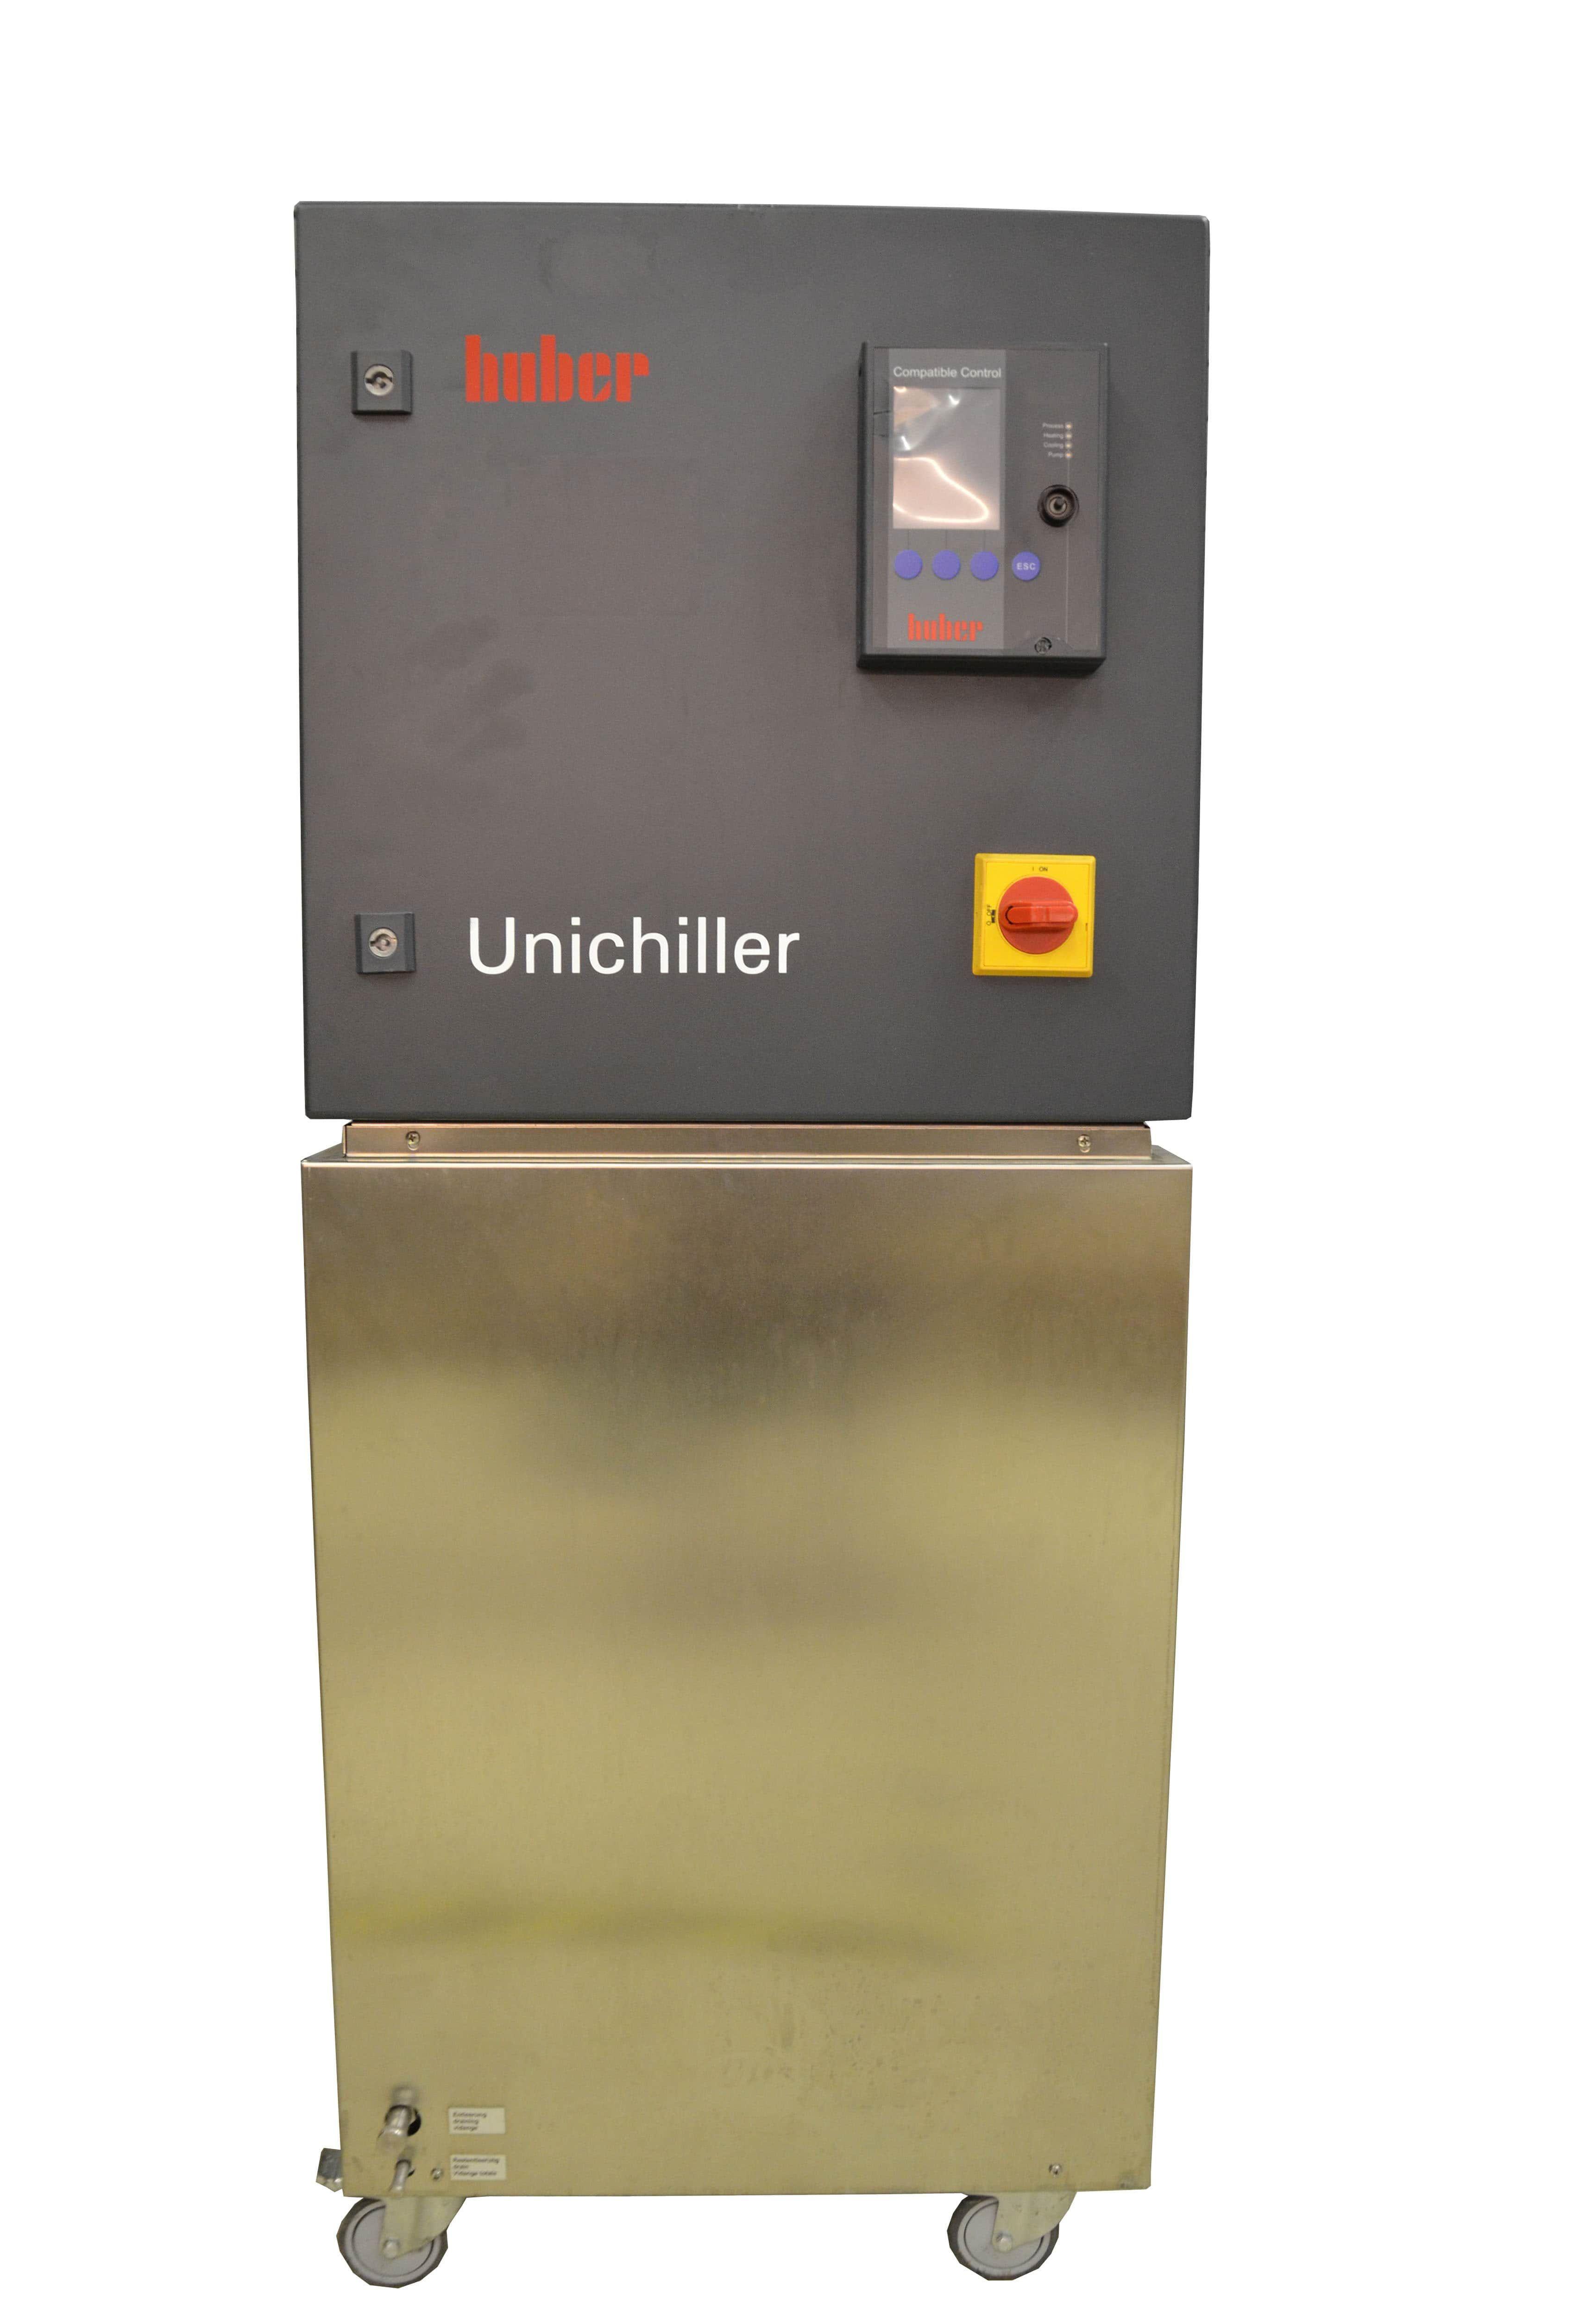 Huber Unichiller